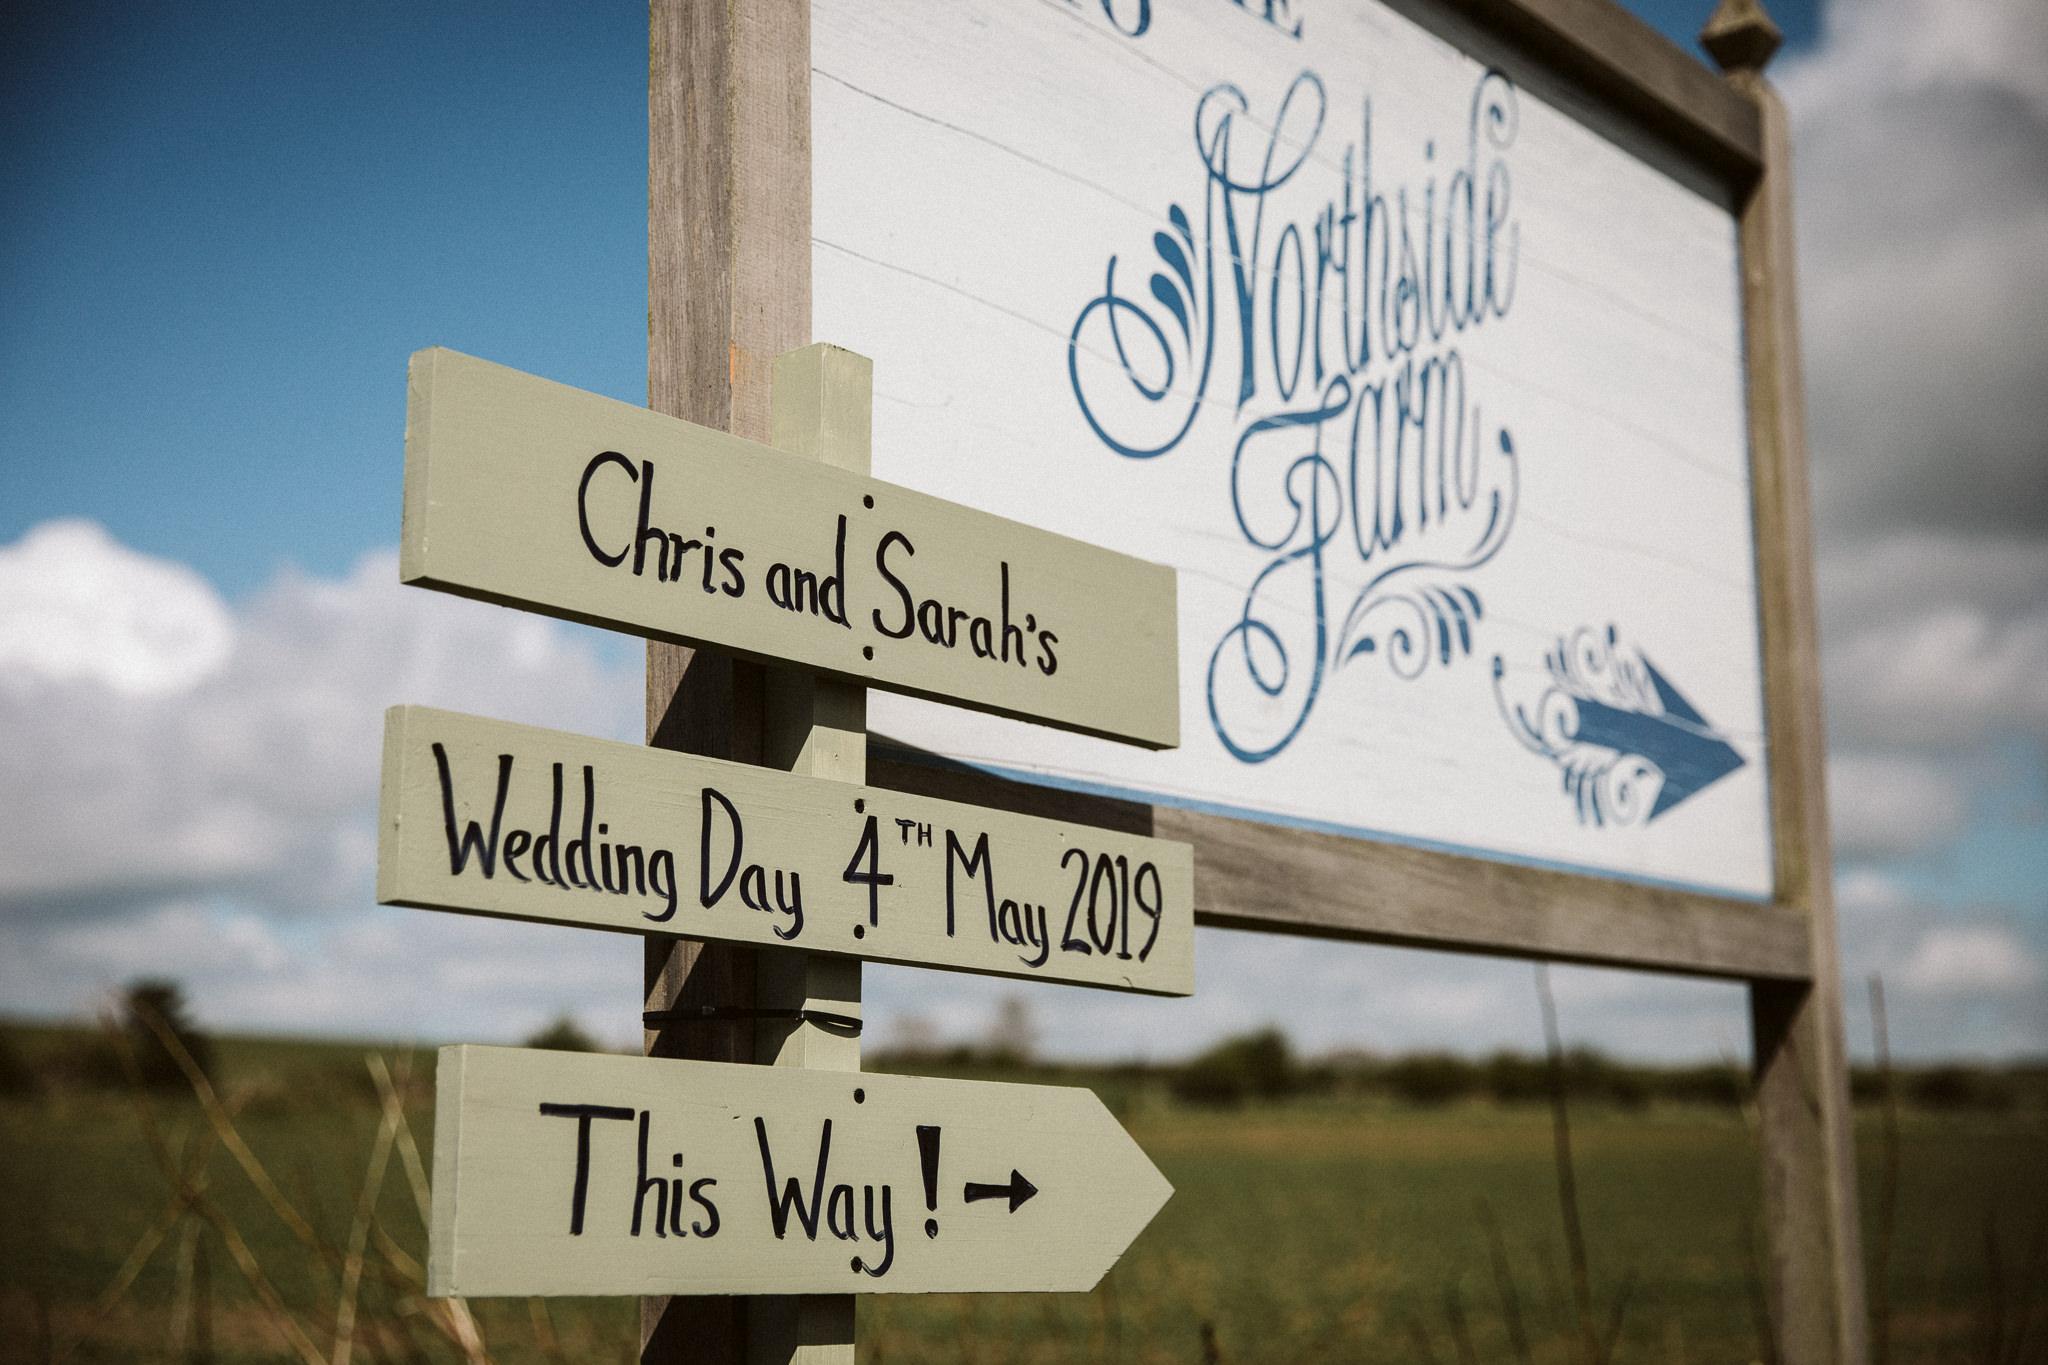 northside-farm-wedding-northumberland-margarita-hope (43).jpg